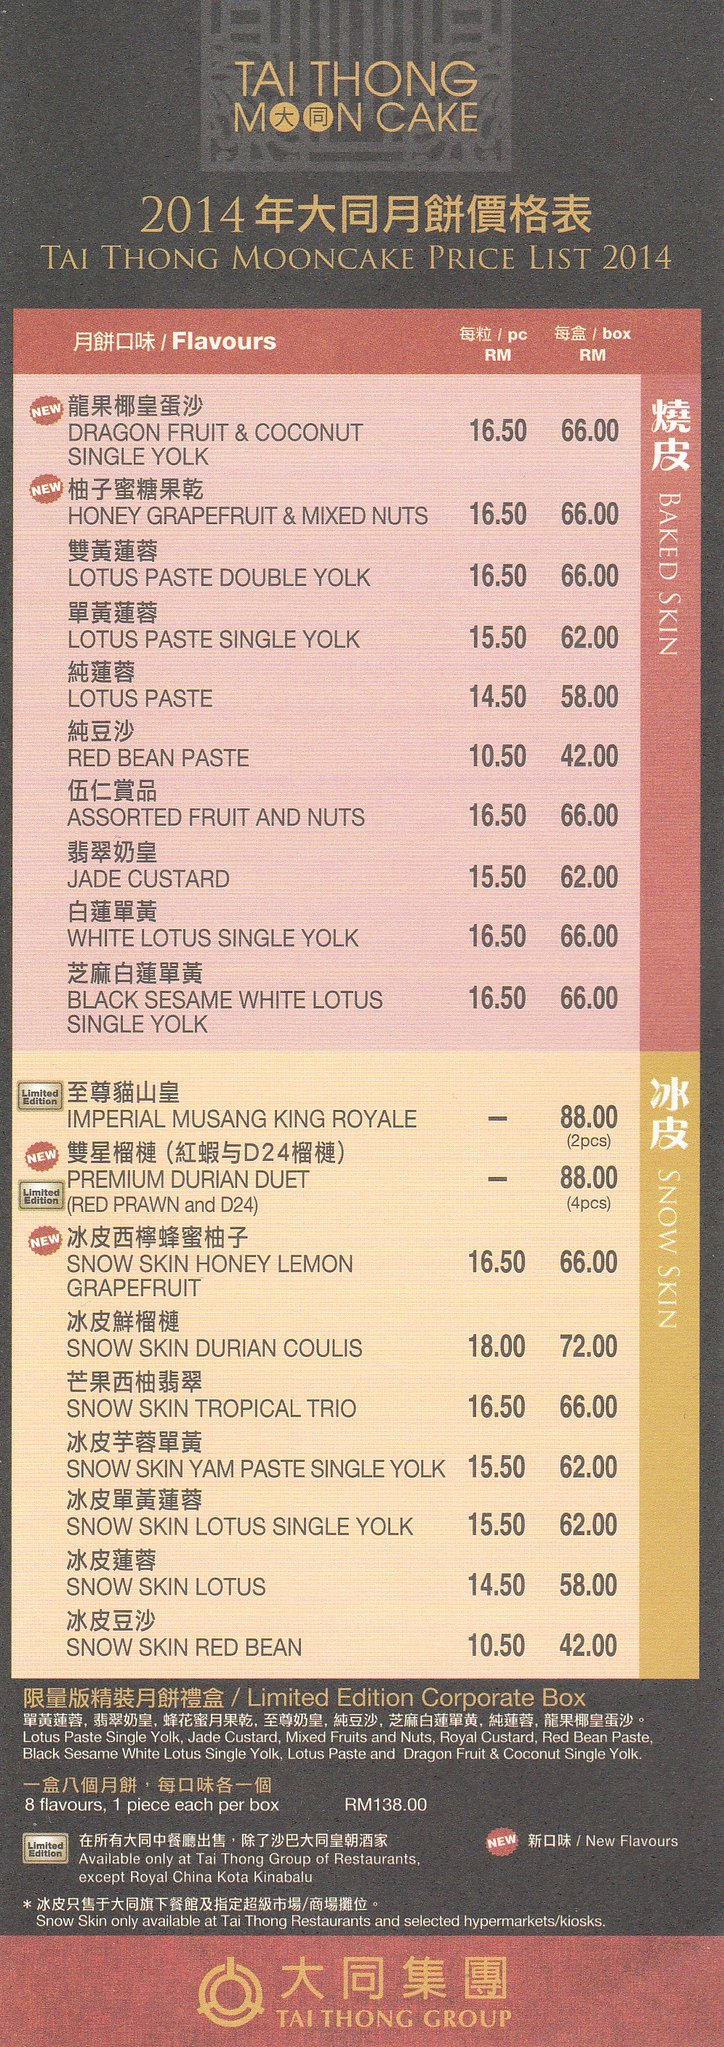 Tai Thong Mooncake Prices 2014